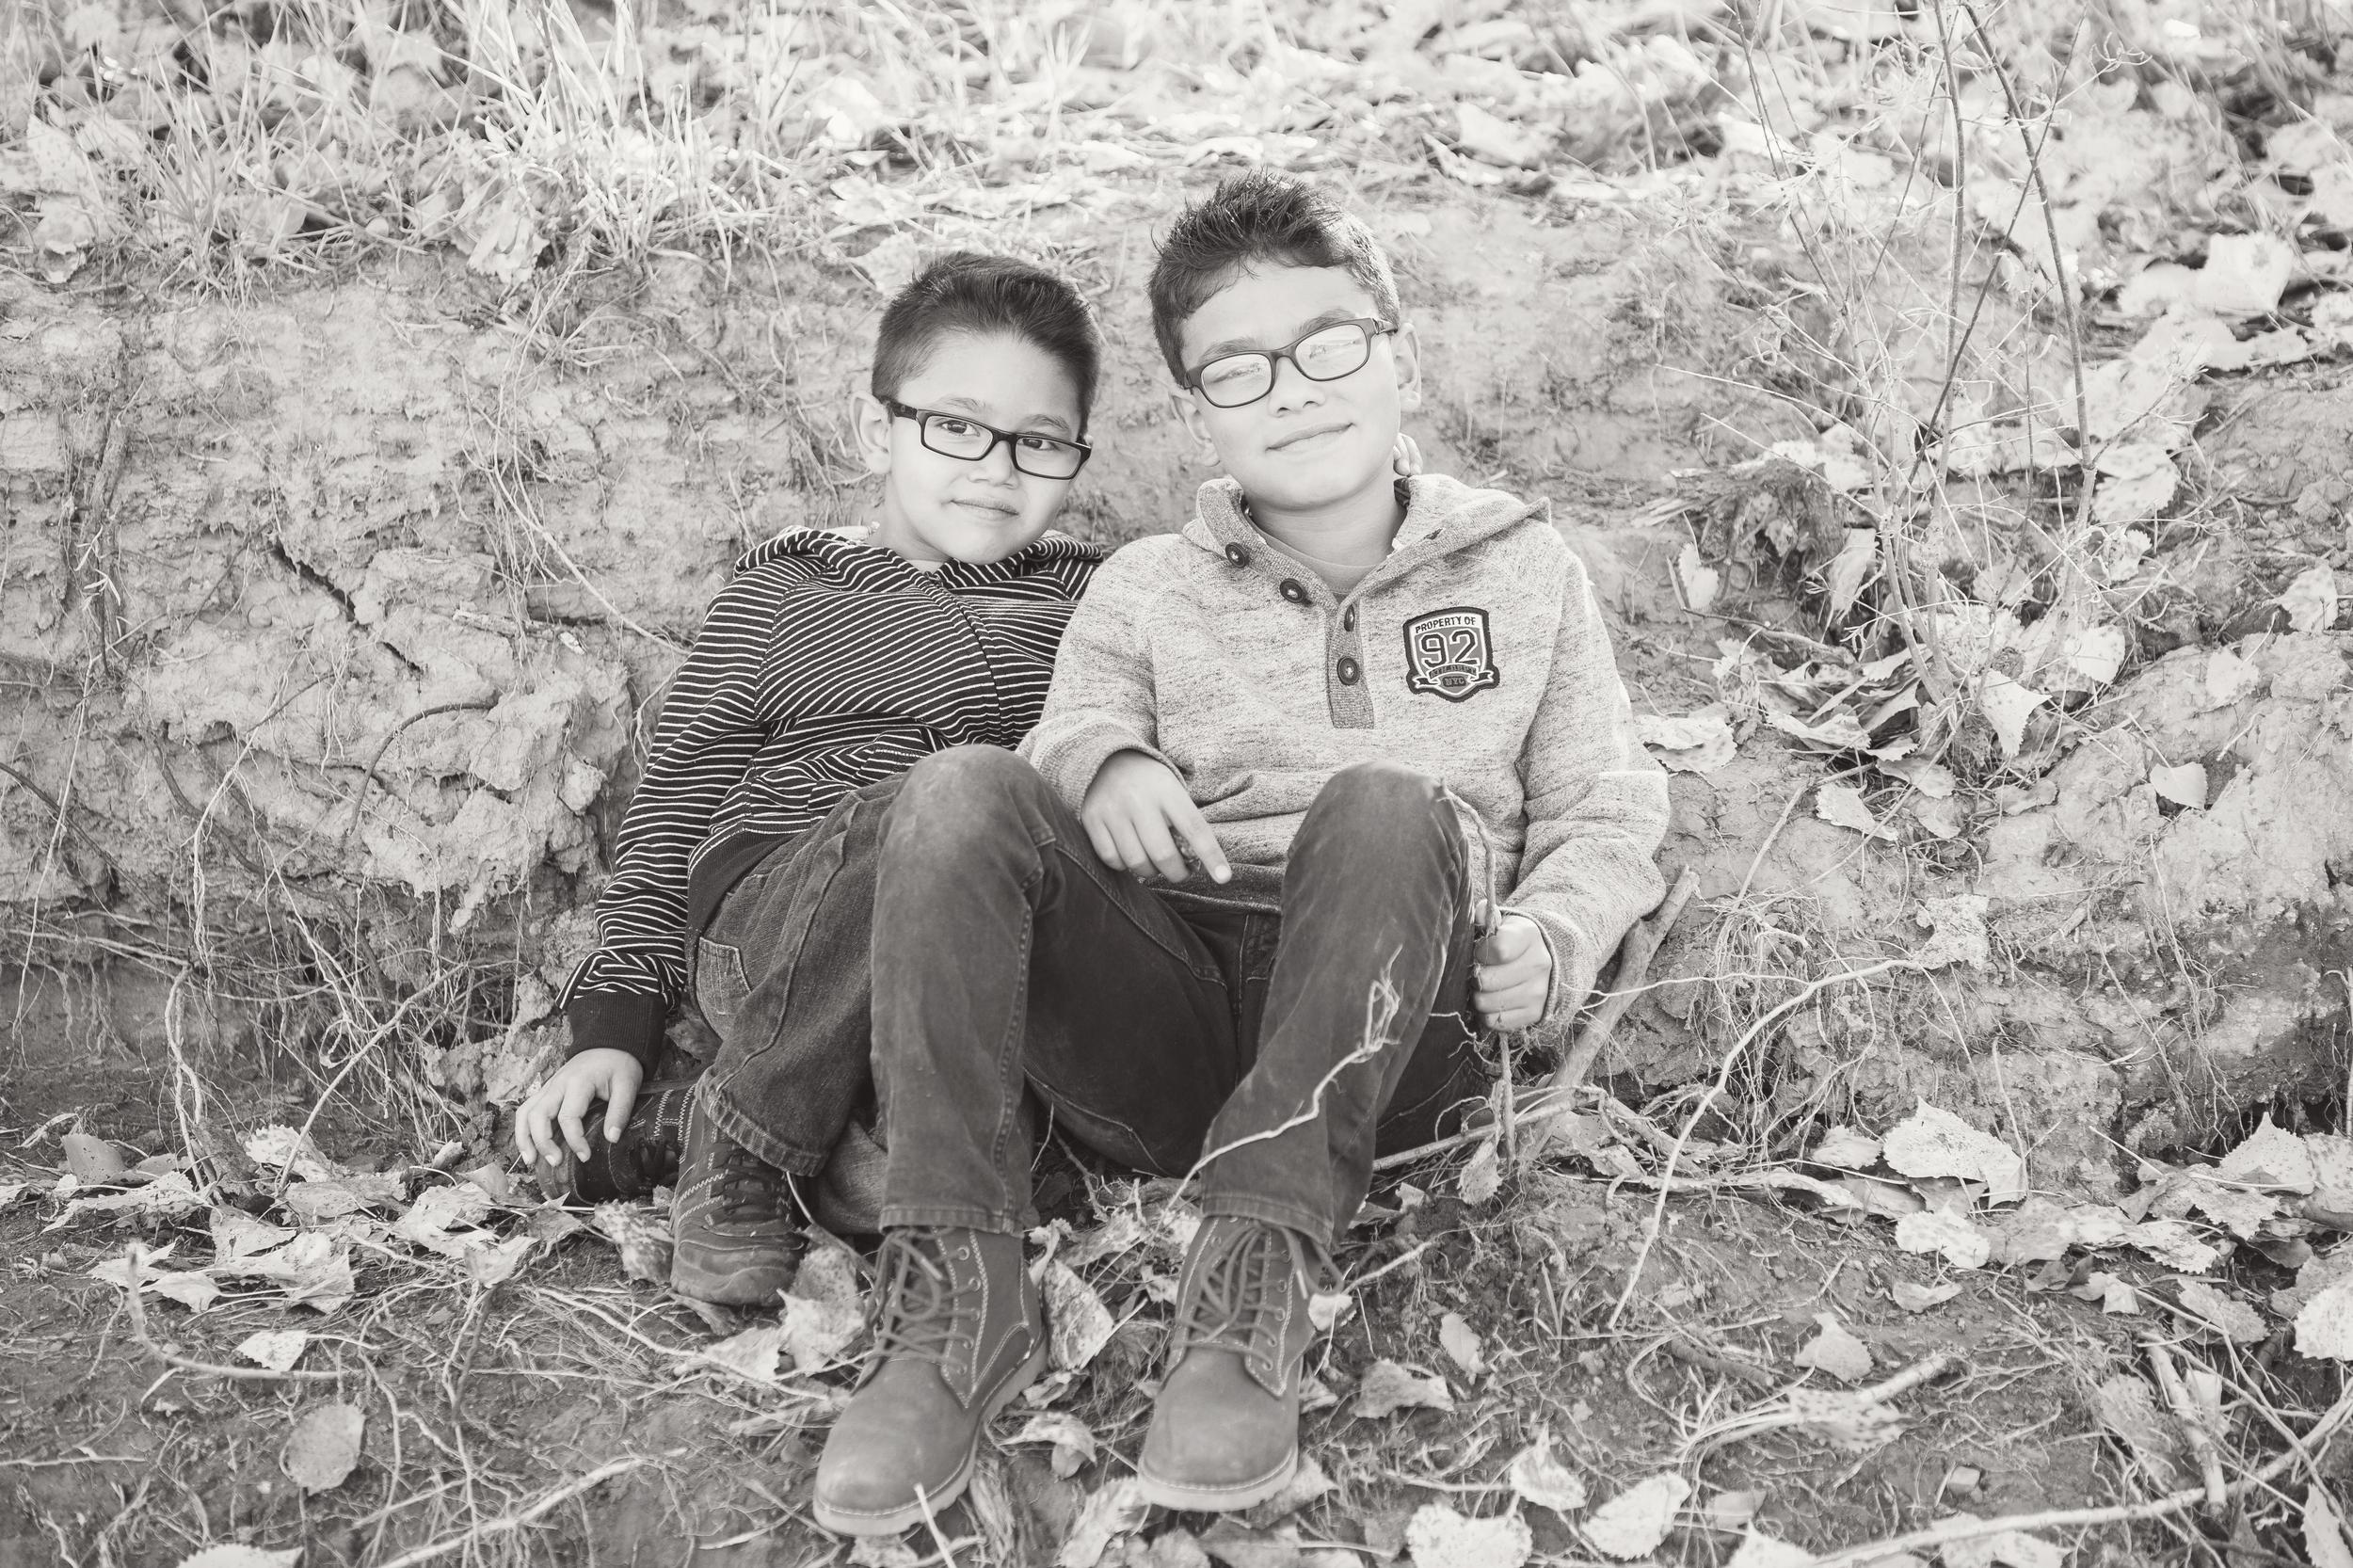 Family_Photos_2014_034_bw.jpg